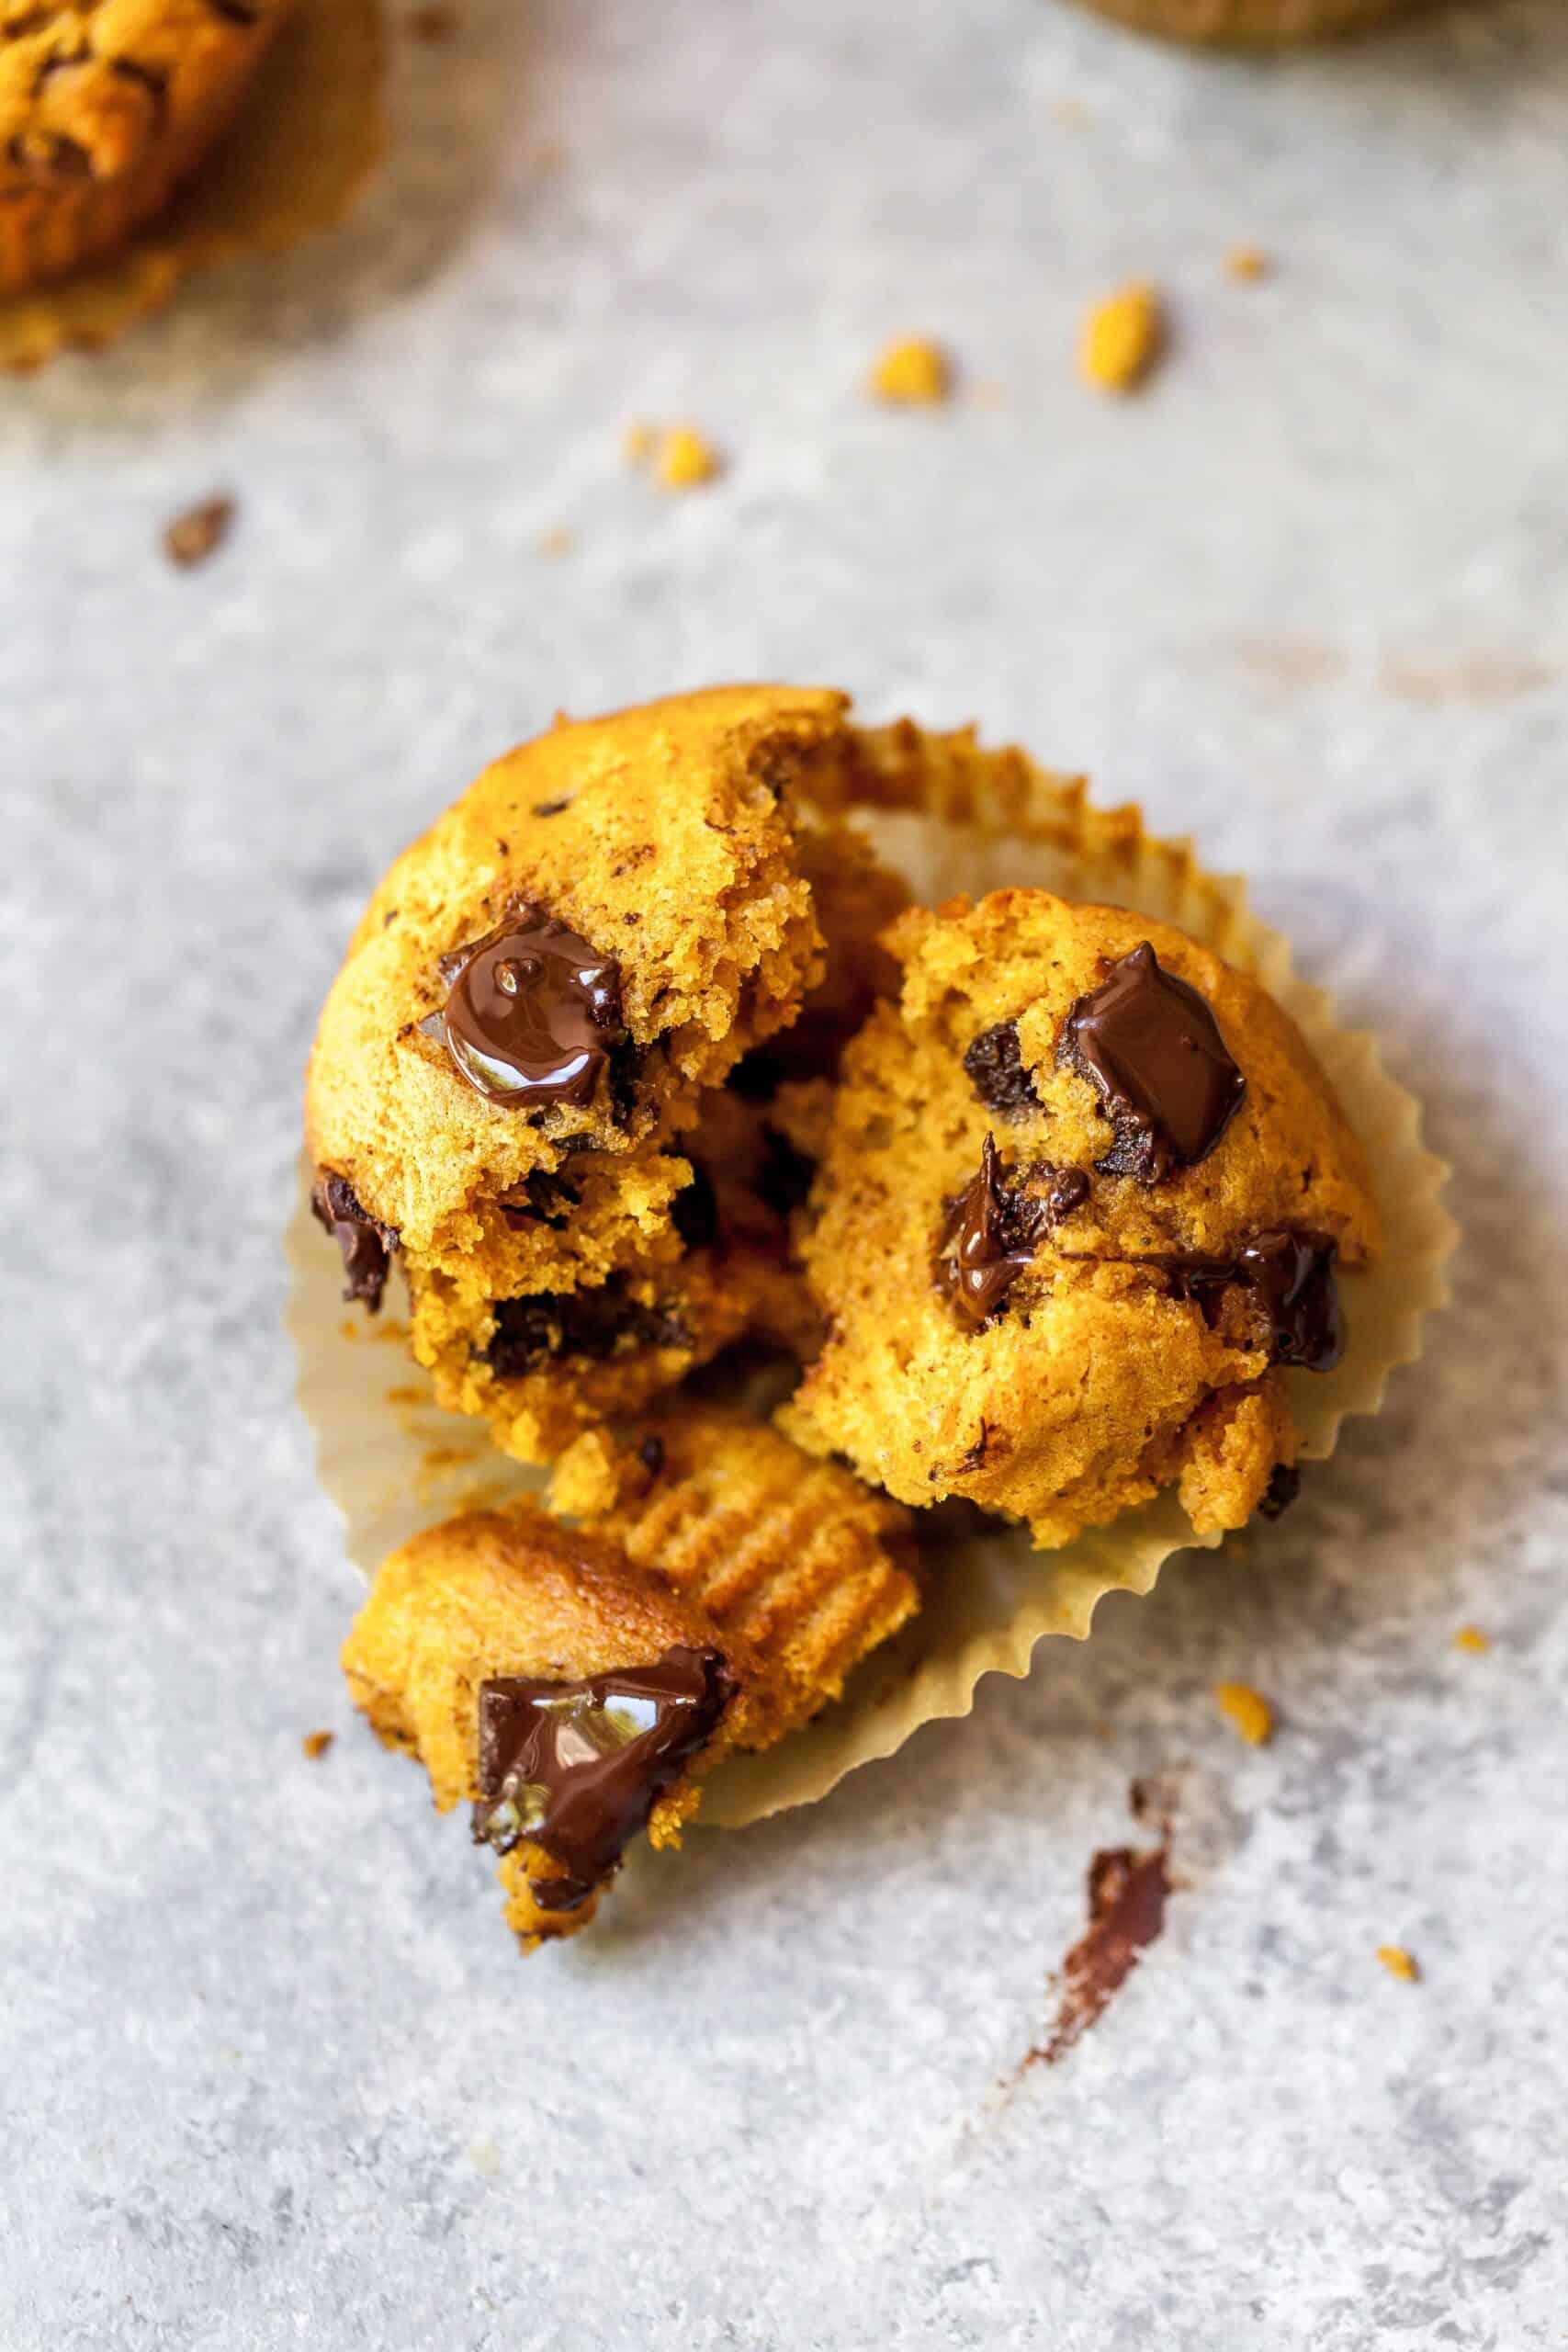 Closeup shot of a pumpkin spice chocolate chunk muffin broken into pieces